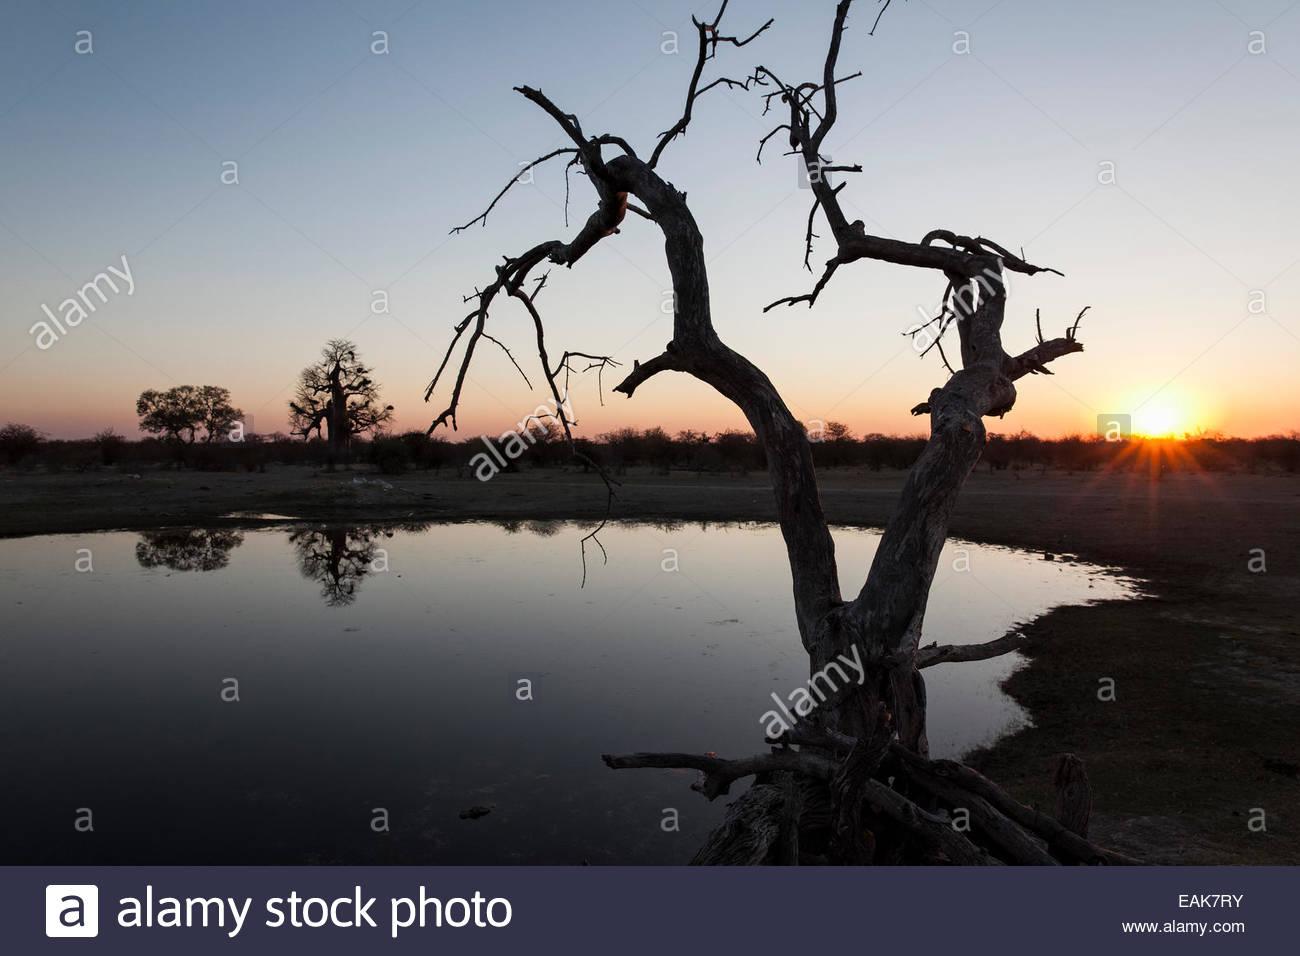 Dead tree at a water hole, Botswana - Stock Image